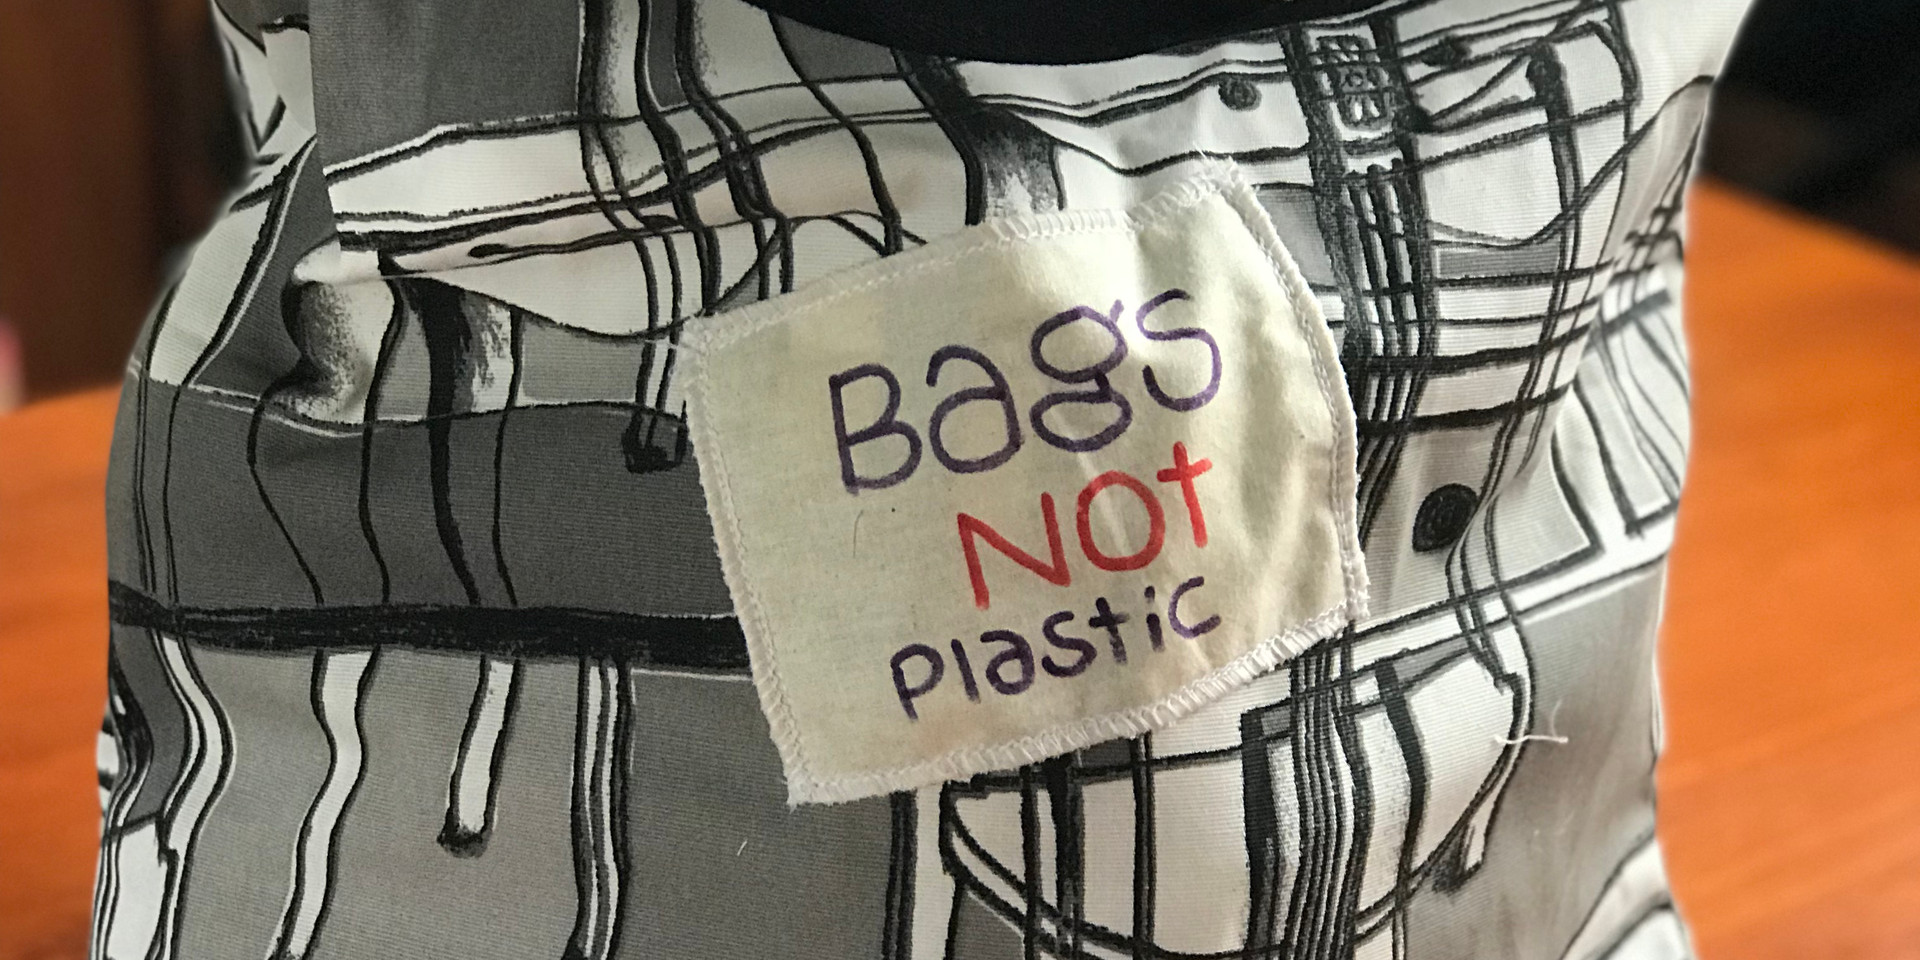 Tote bag ReCycle ReCreate